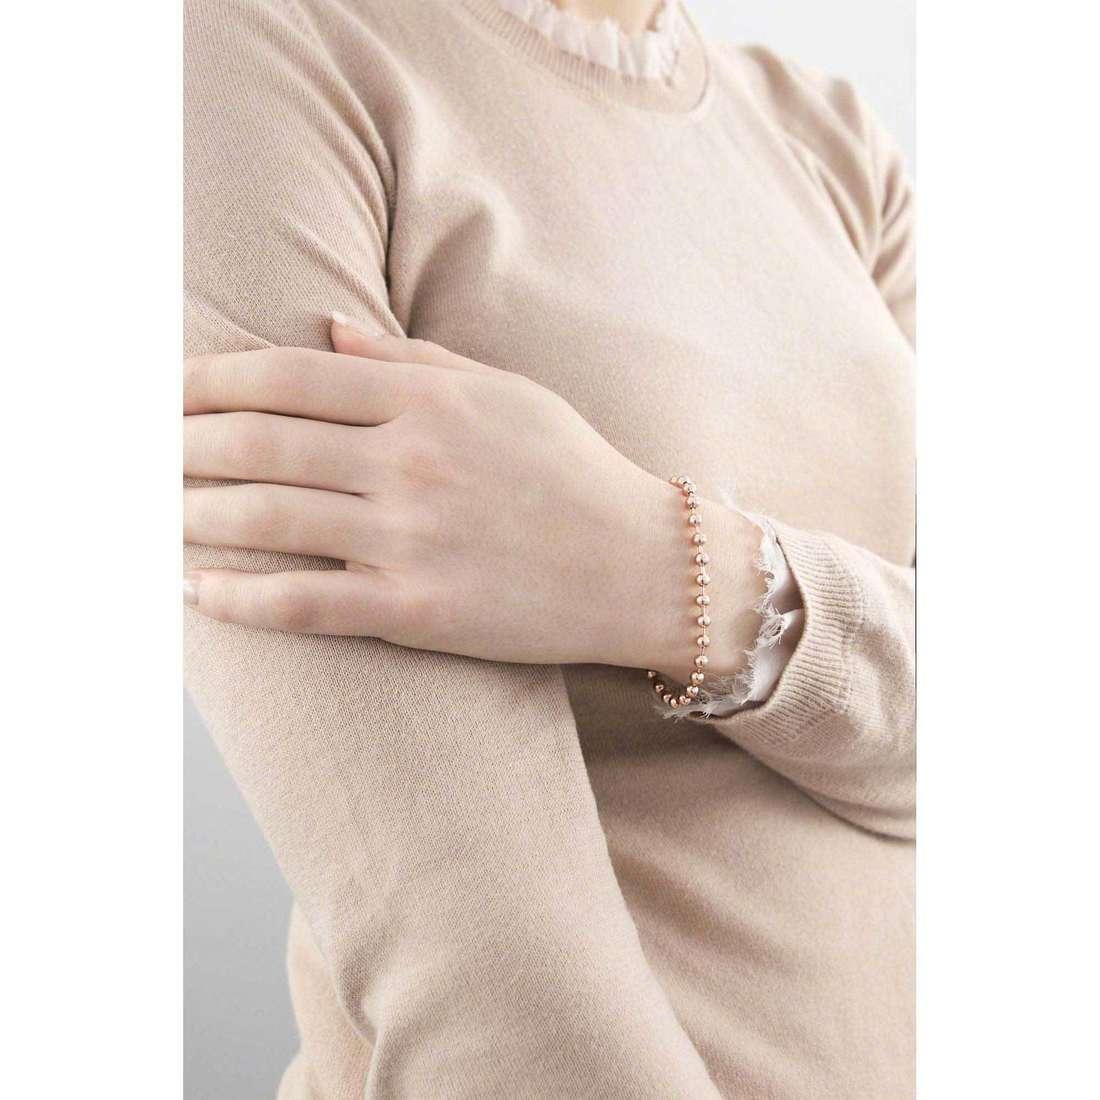 Marlù bracelets Nel mio Cuore femme 15BR011R indosso